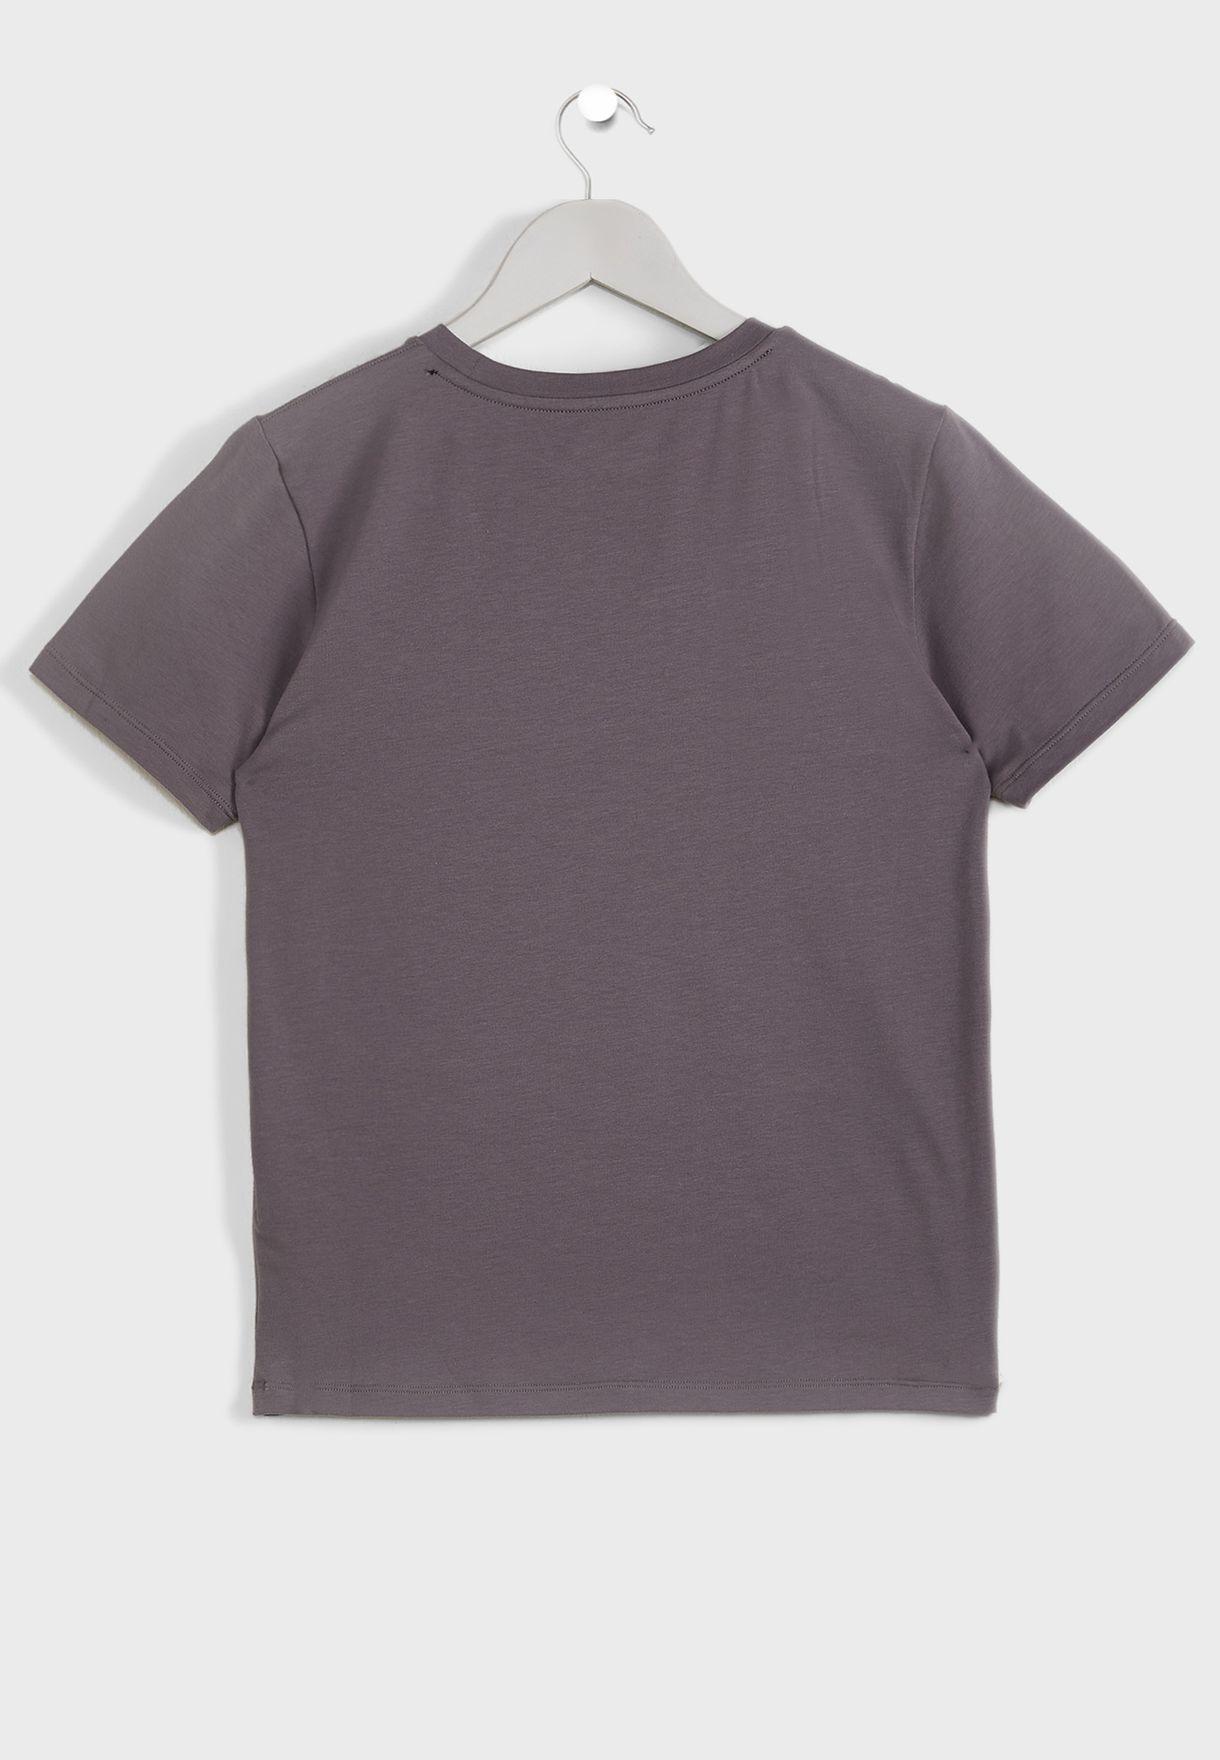 Teen Casual Set Shorts+T-Shirt